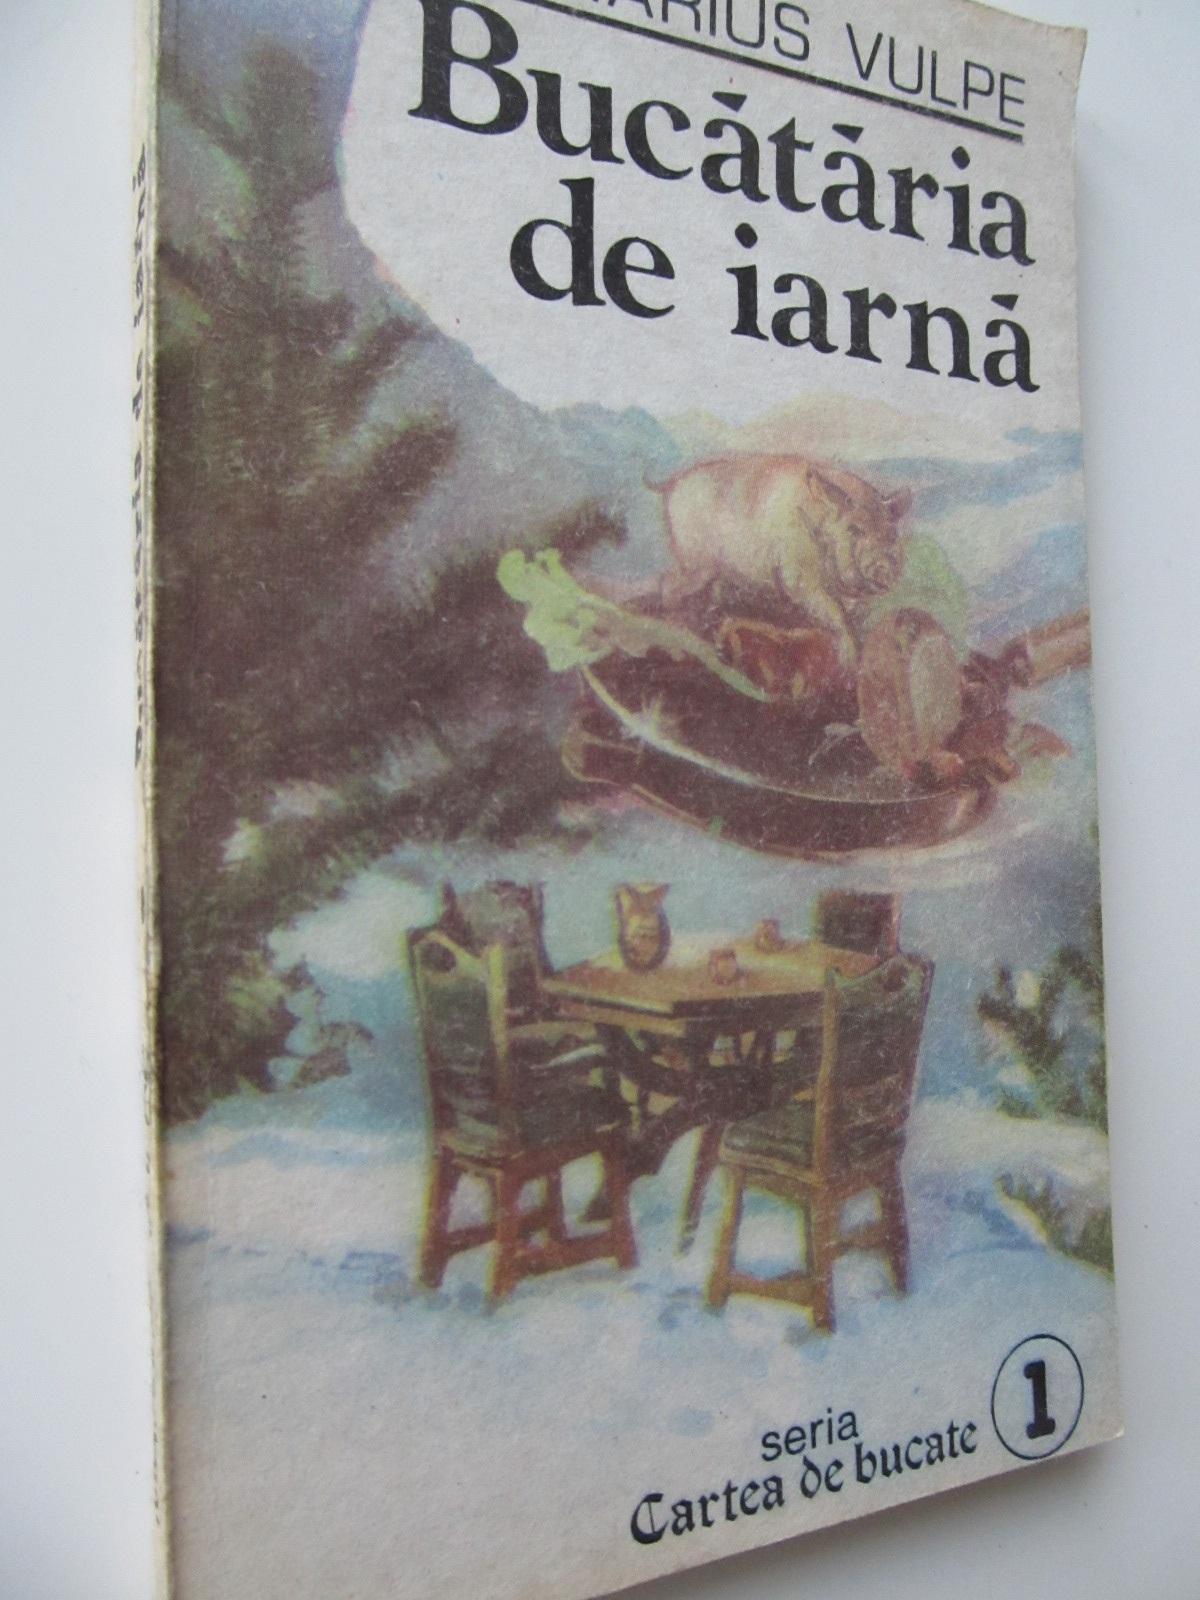 Bucataria de iarna - Marius Vulpe | Detalii carte